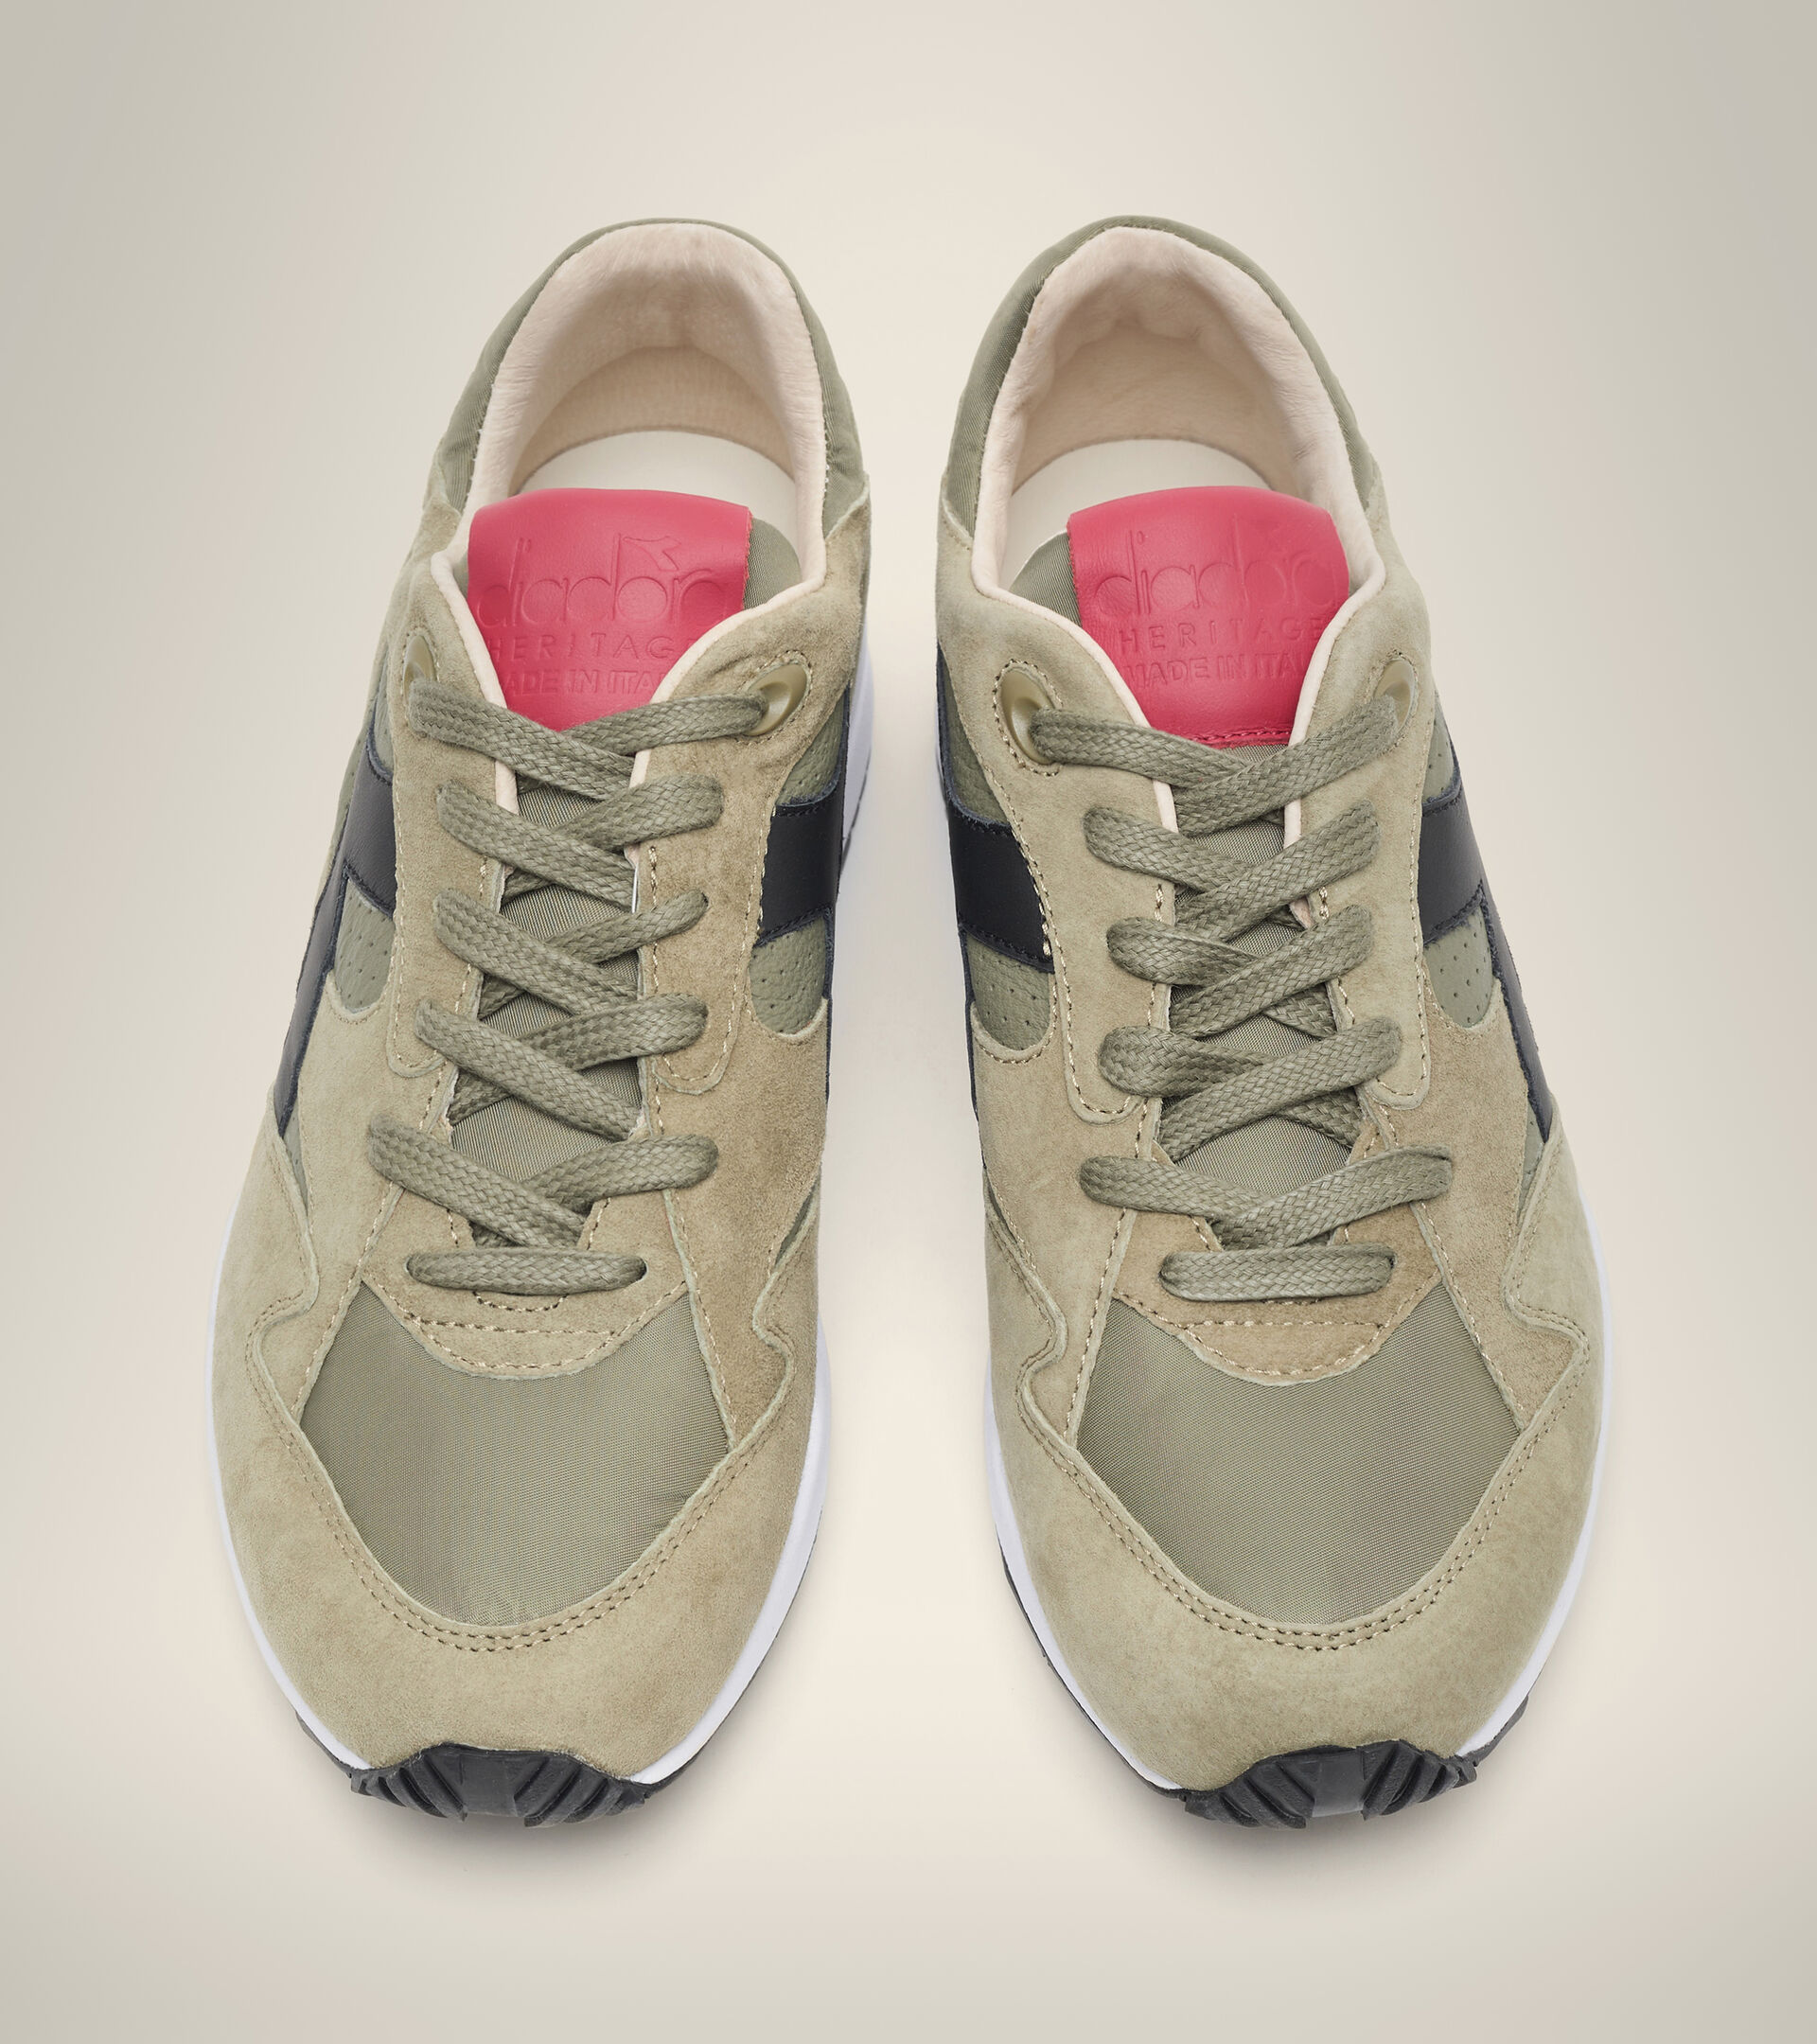 Footwear Heritage UOMO ECLIPSE ITALIA BURNT OLIVE GREEN Diadora